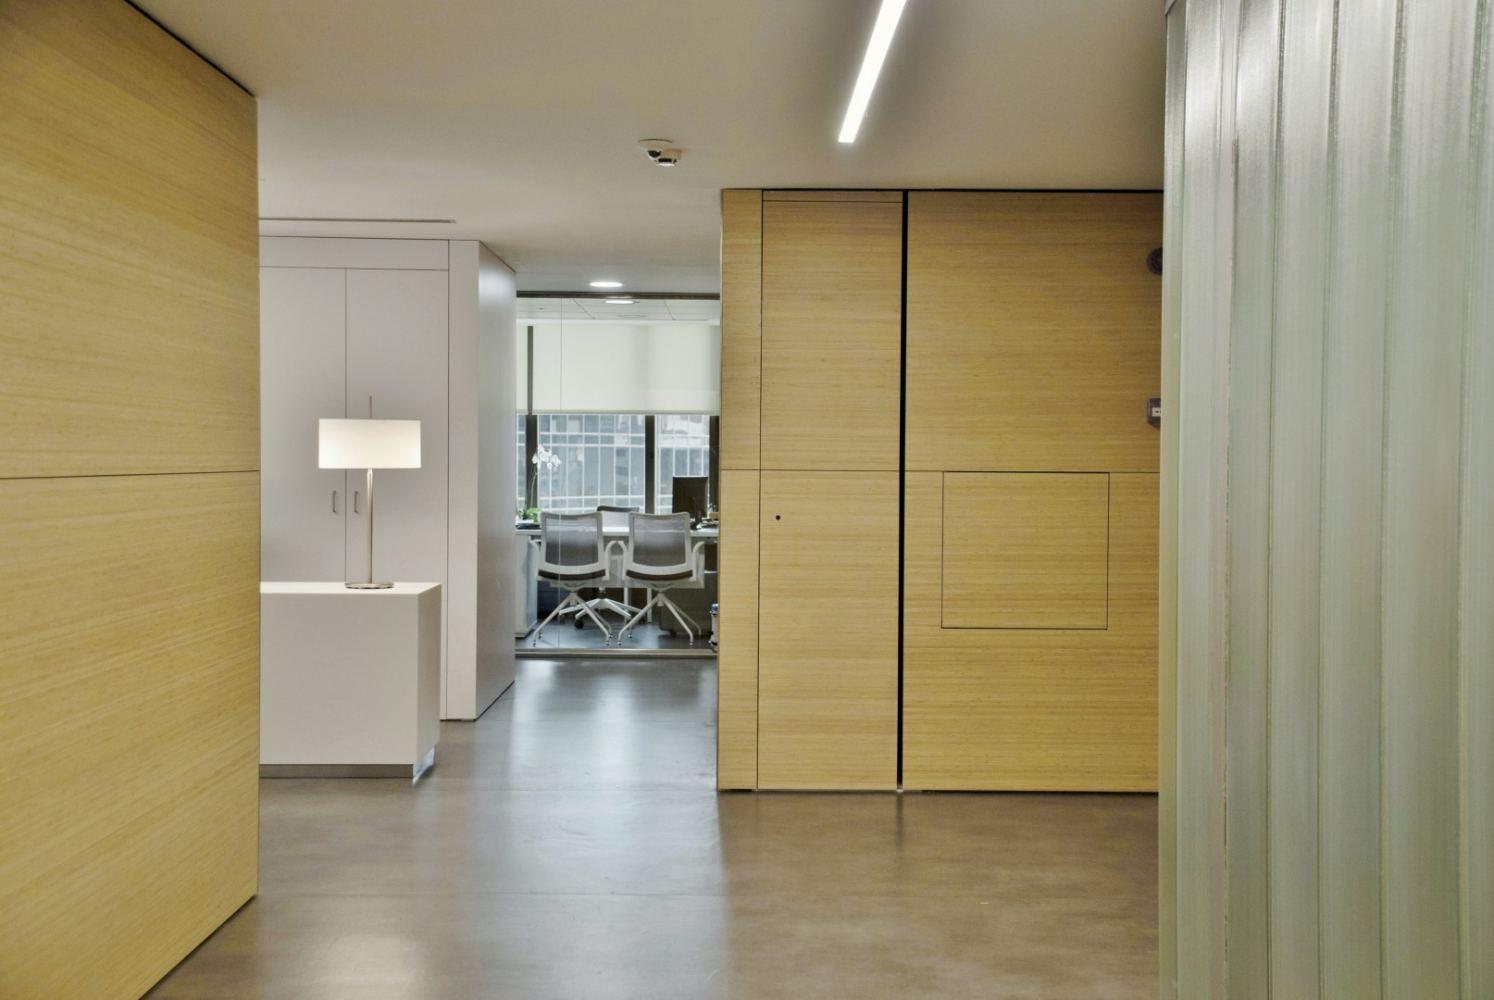 Barcelona's Hospital - Bamboo 4